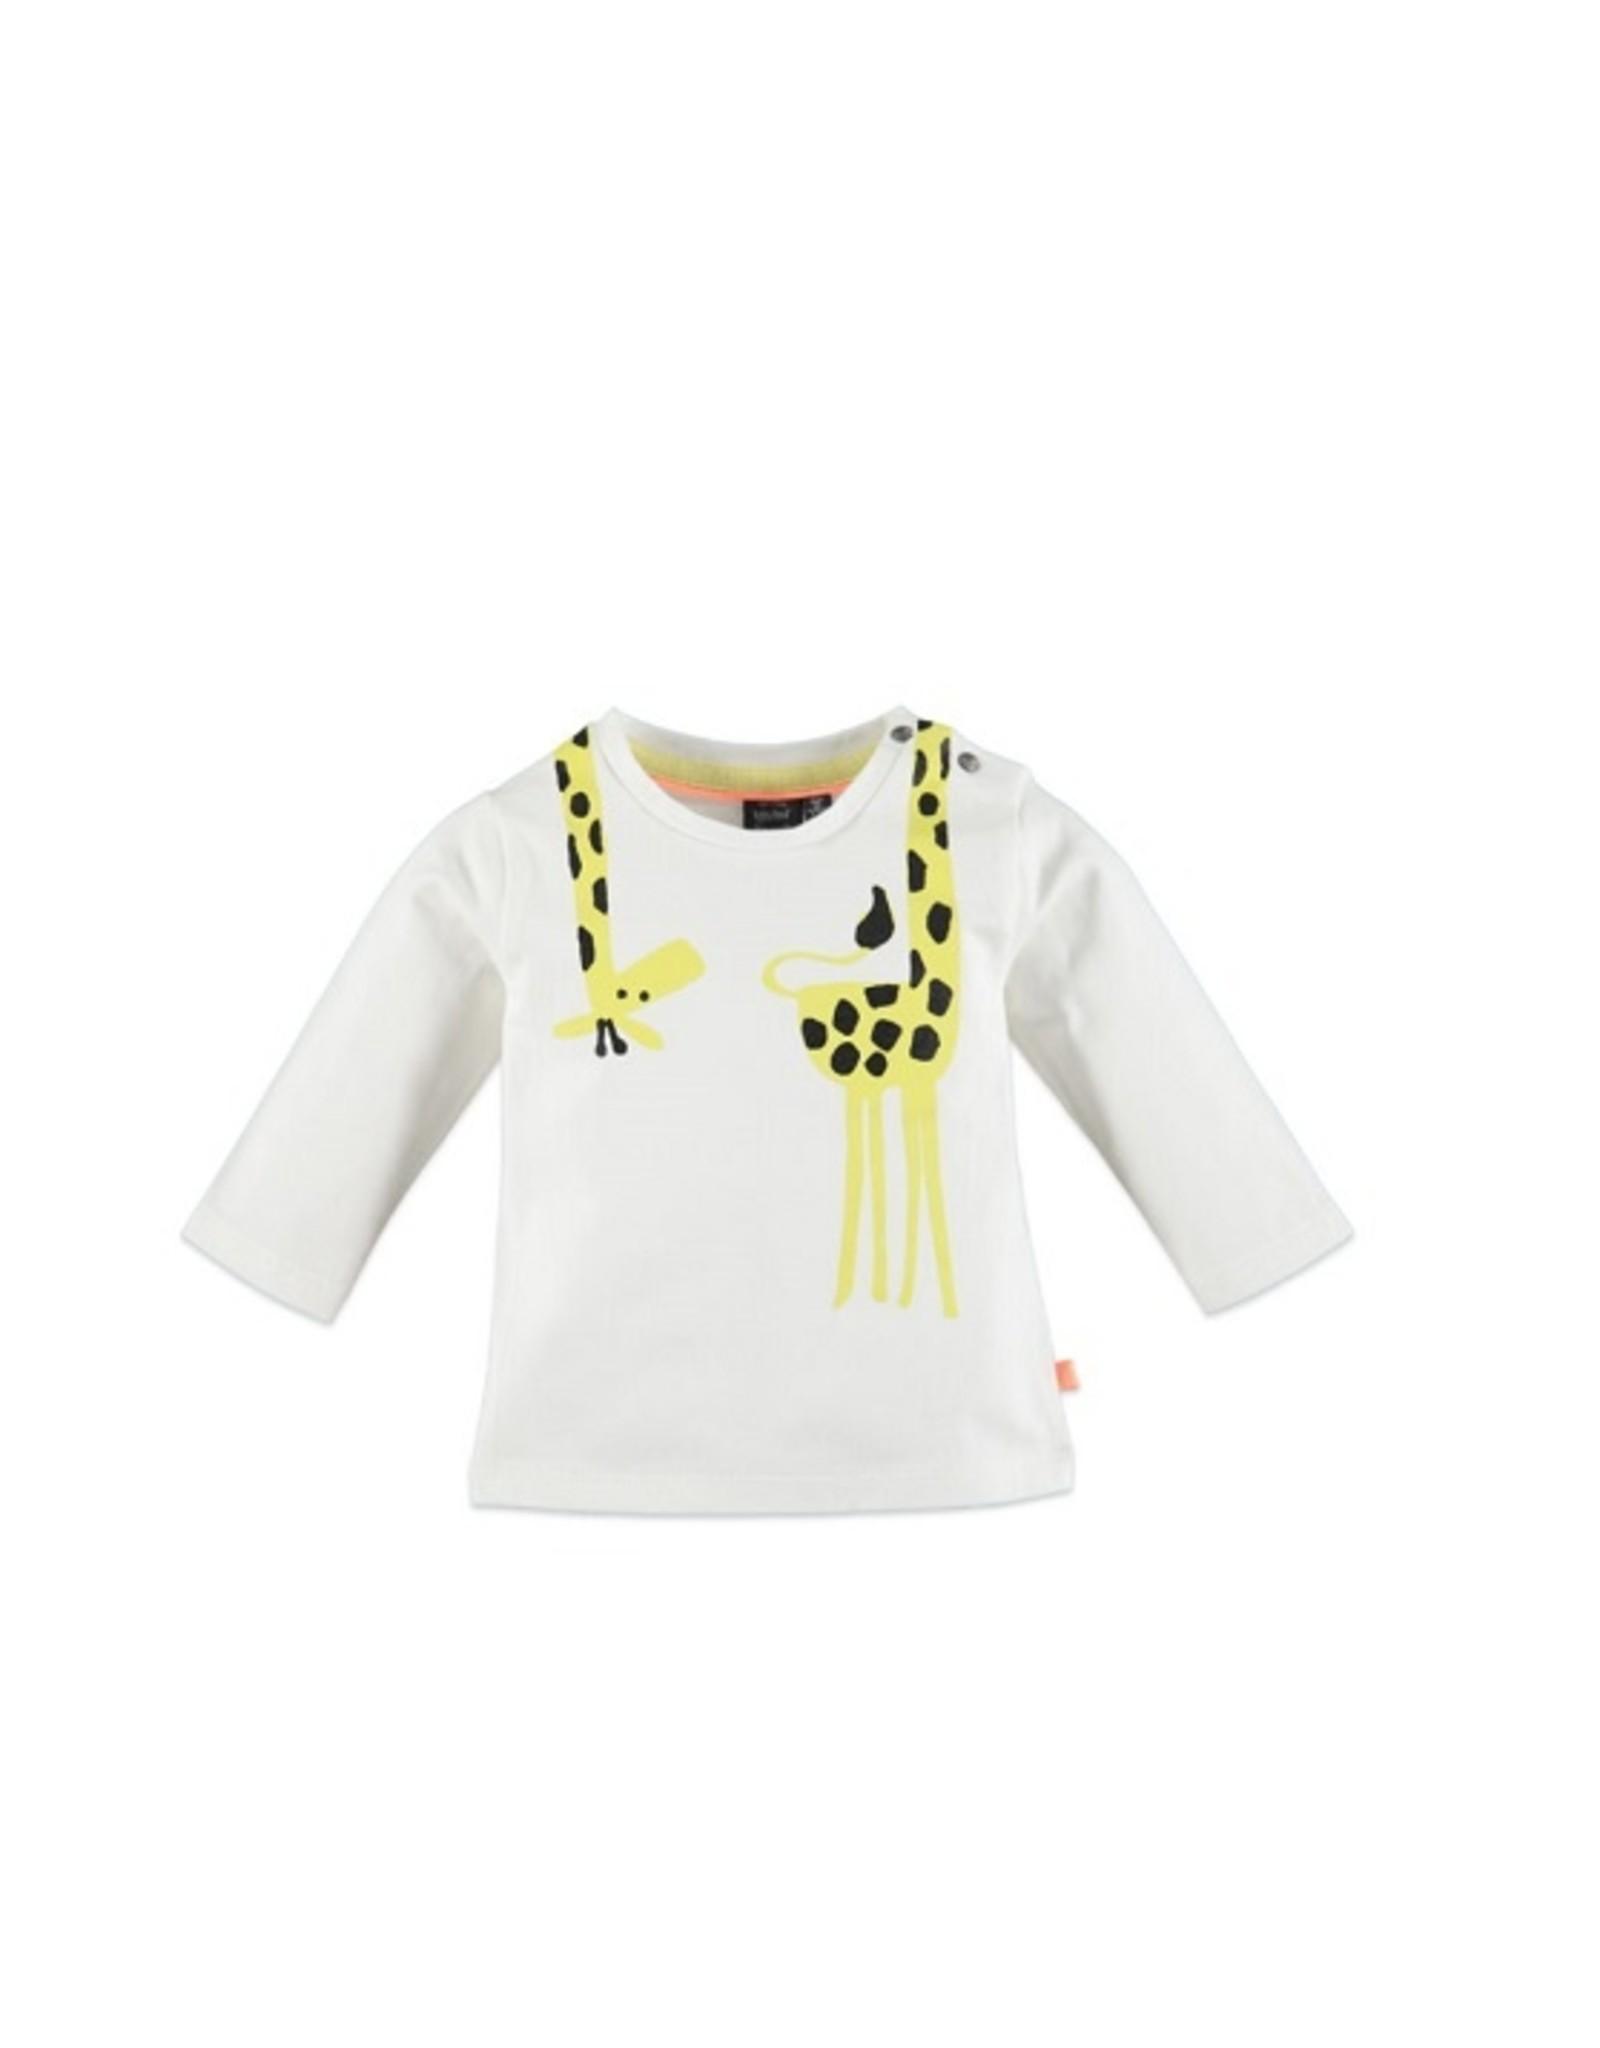 Babyface Jongens T-shirt ecru giraf